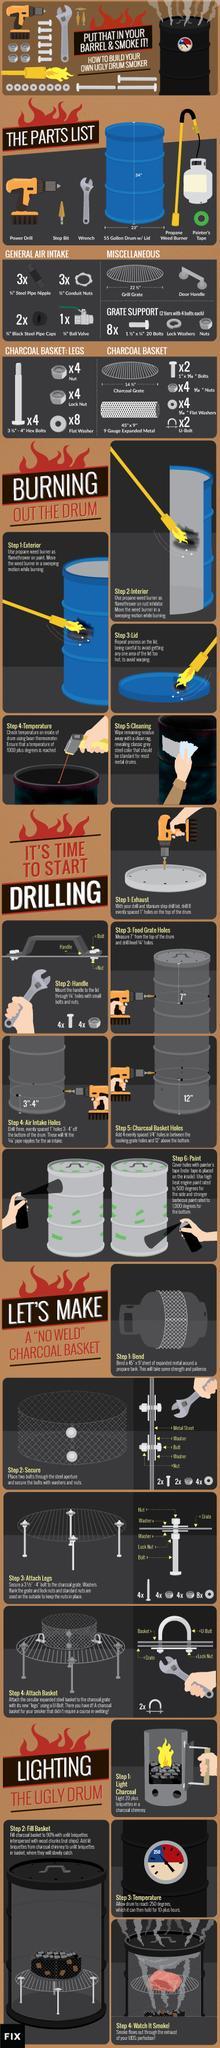 Barrel & smoker